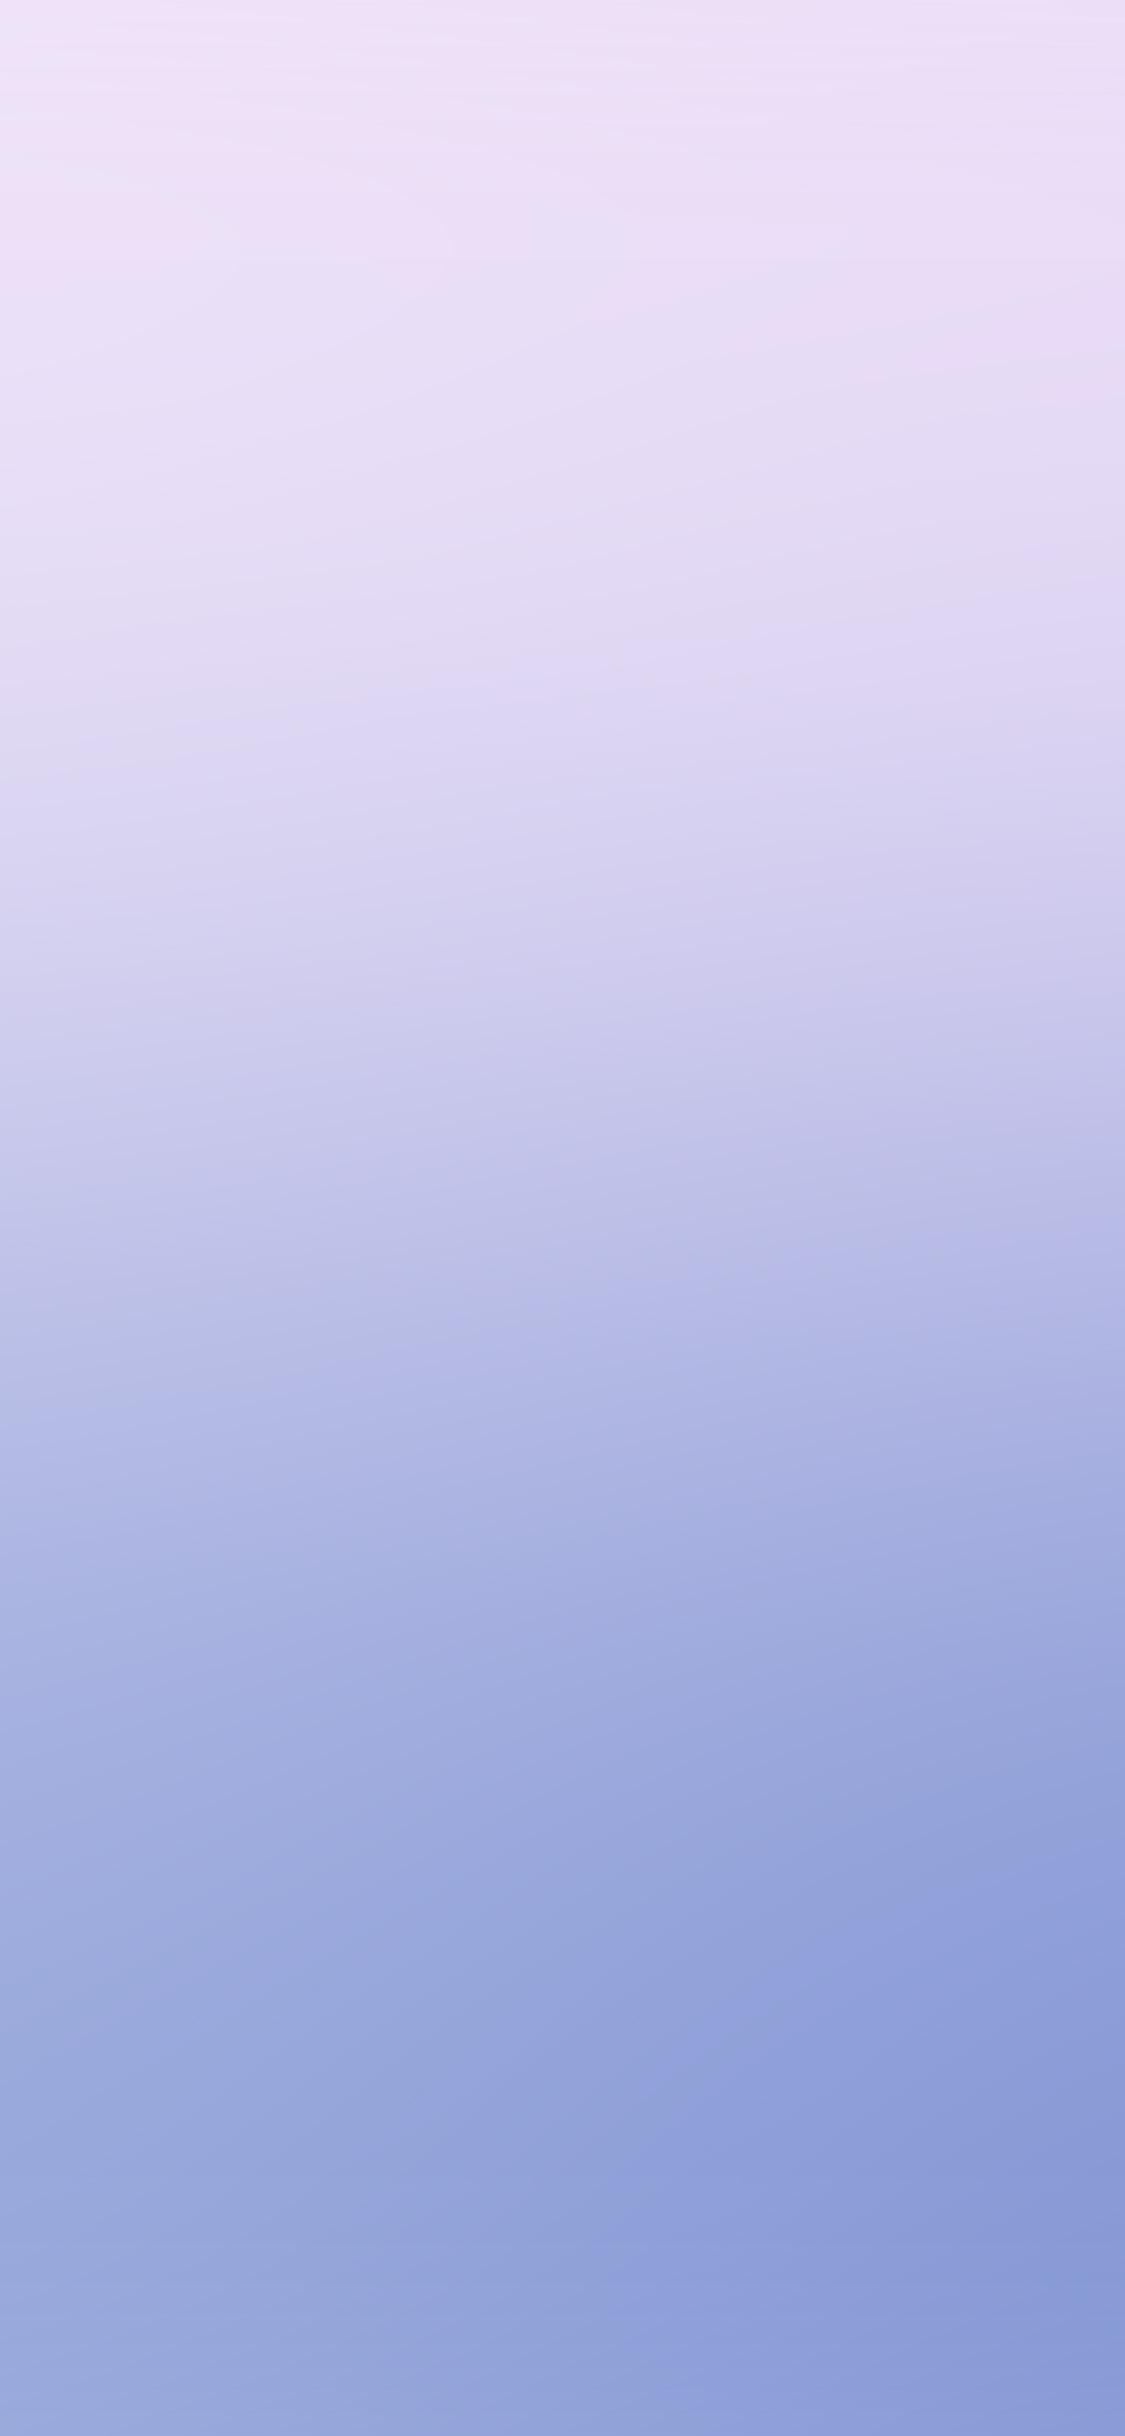 iPhonexpapers.com-Apple-iPhone-wallpaper-sm91-soft-pastel-blue-blur-gradation